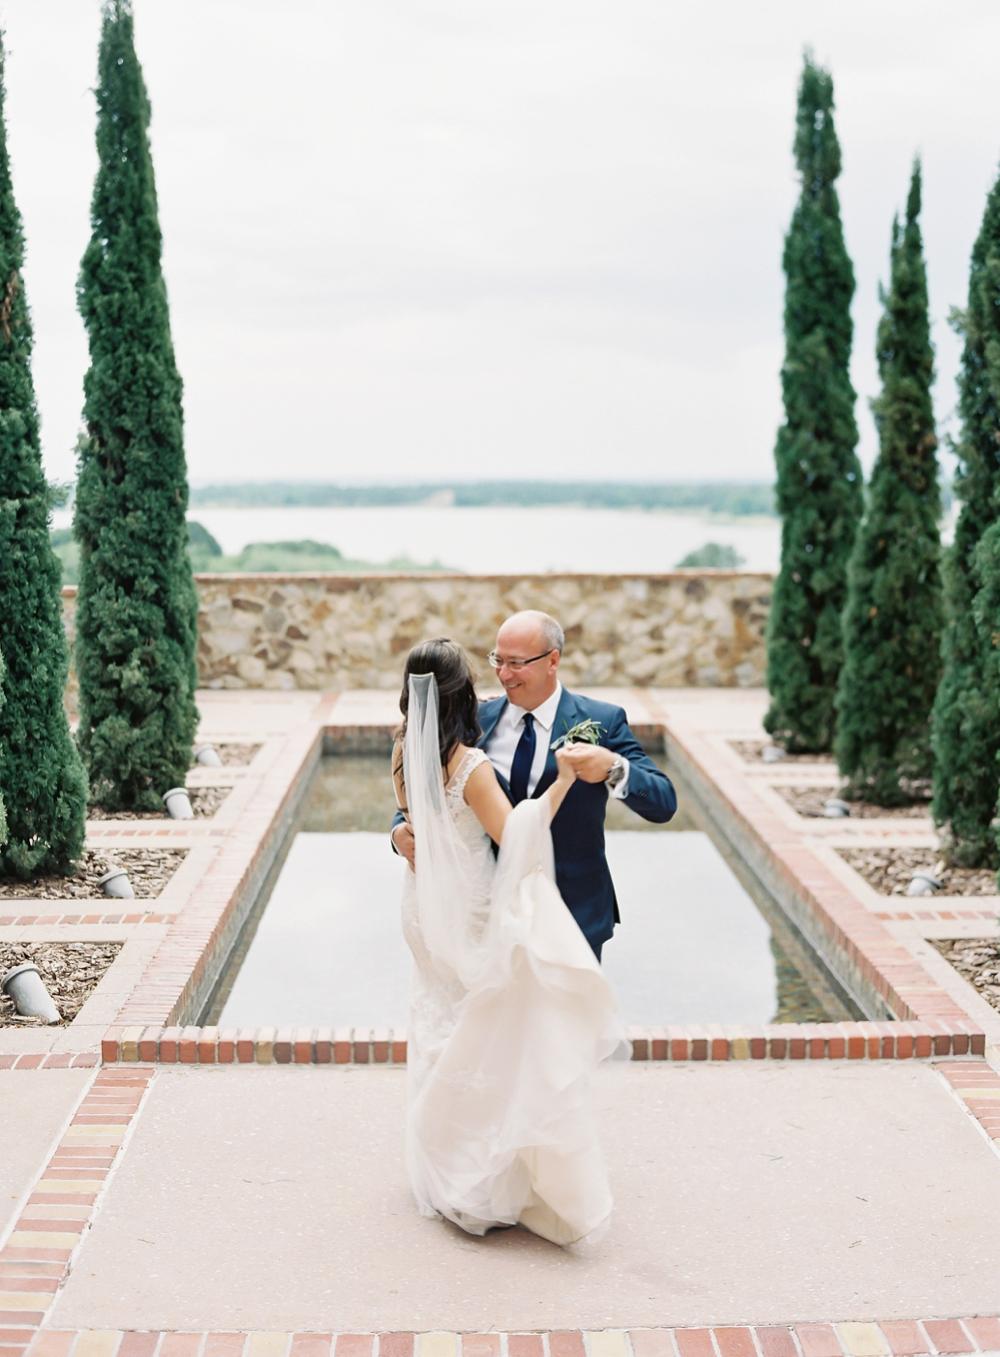 Vicki+Grafton+Photography+-+Fine+Art+Film+Wedding+Photographer+-+Bella+Collina+Wedding_0068.jpg